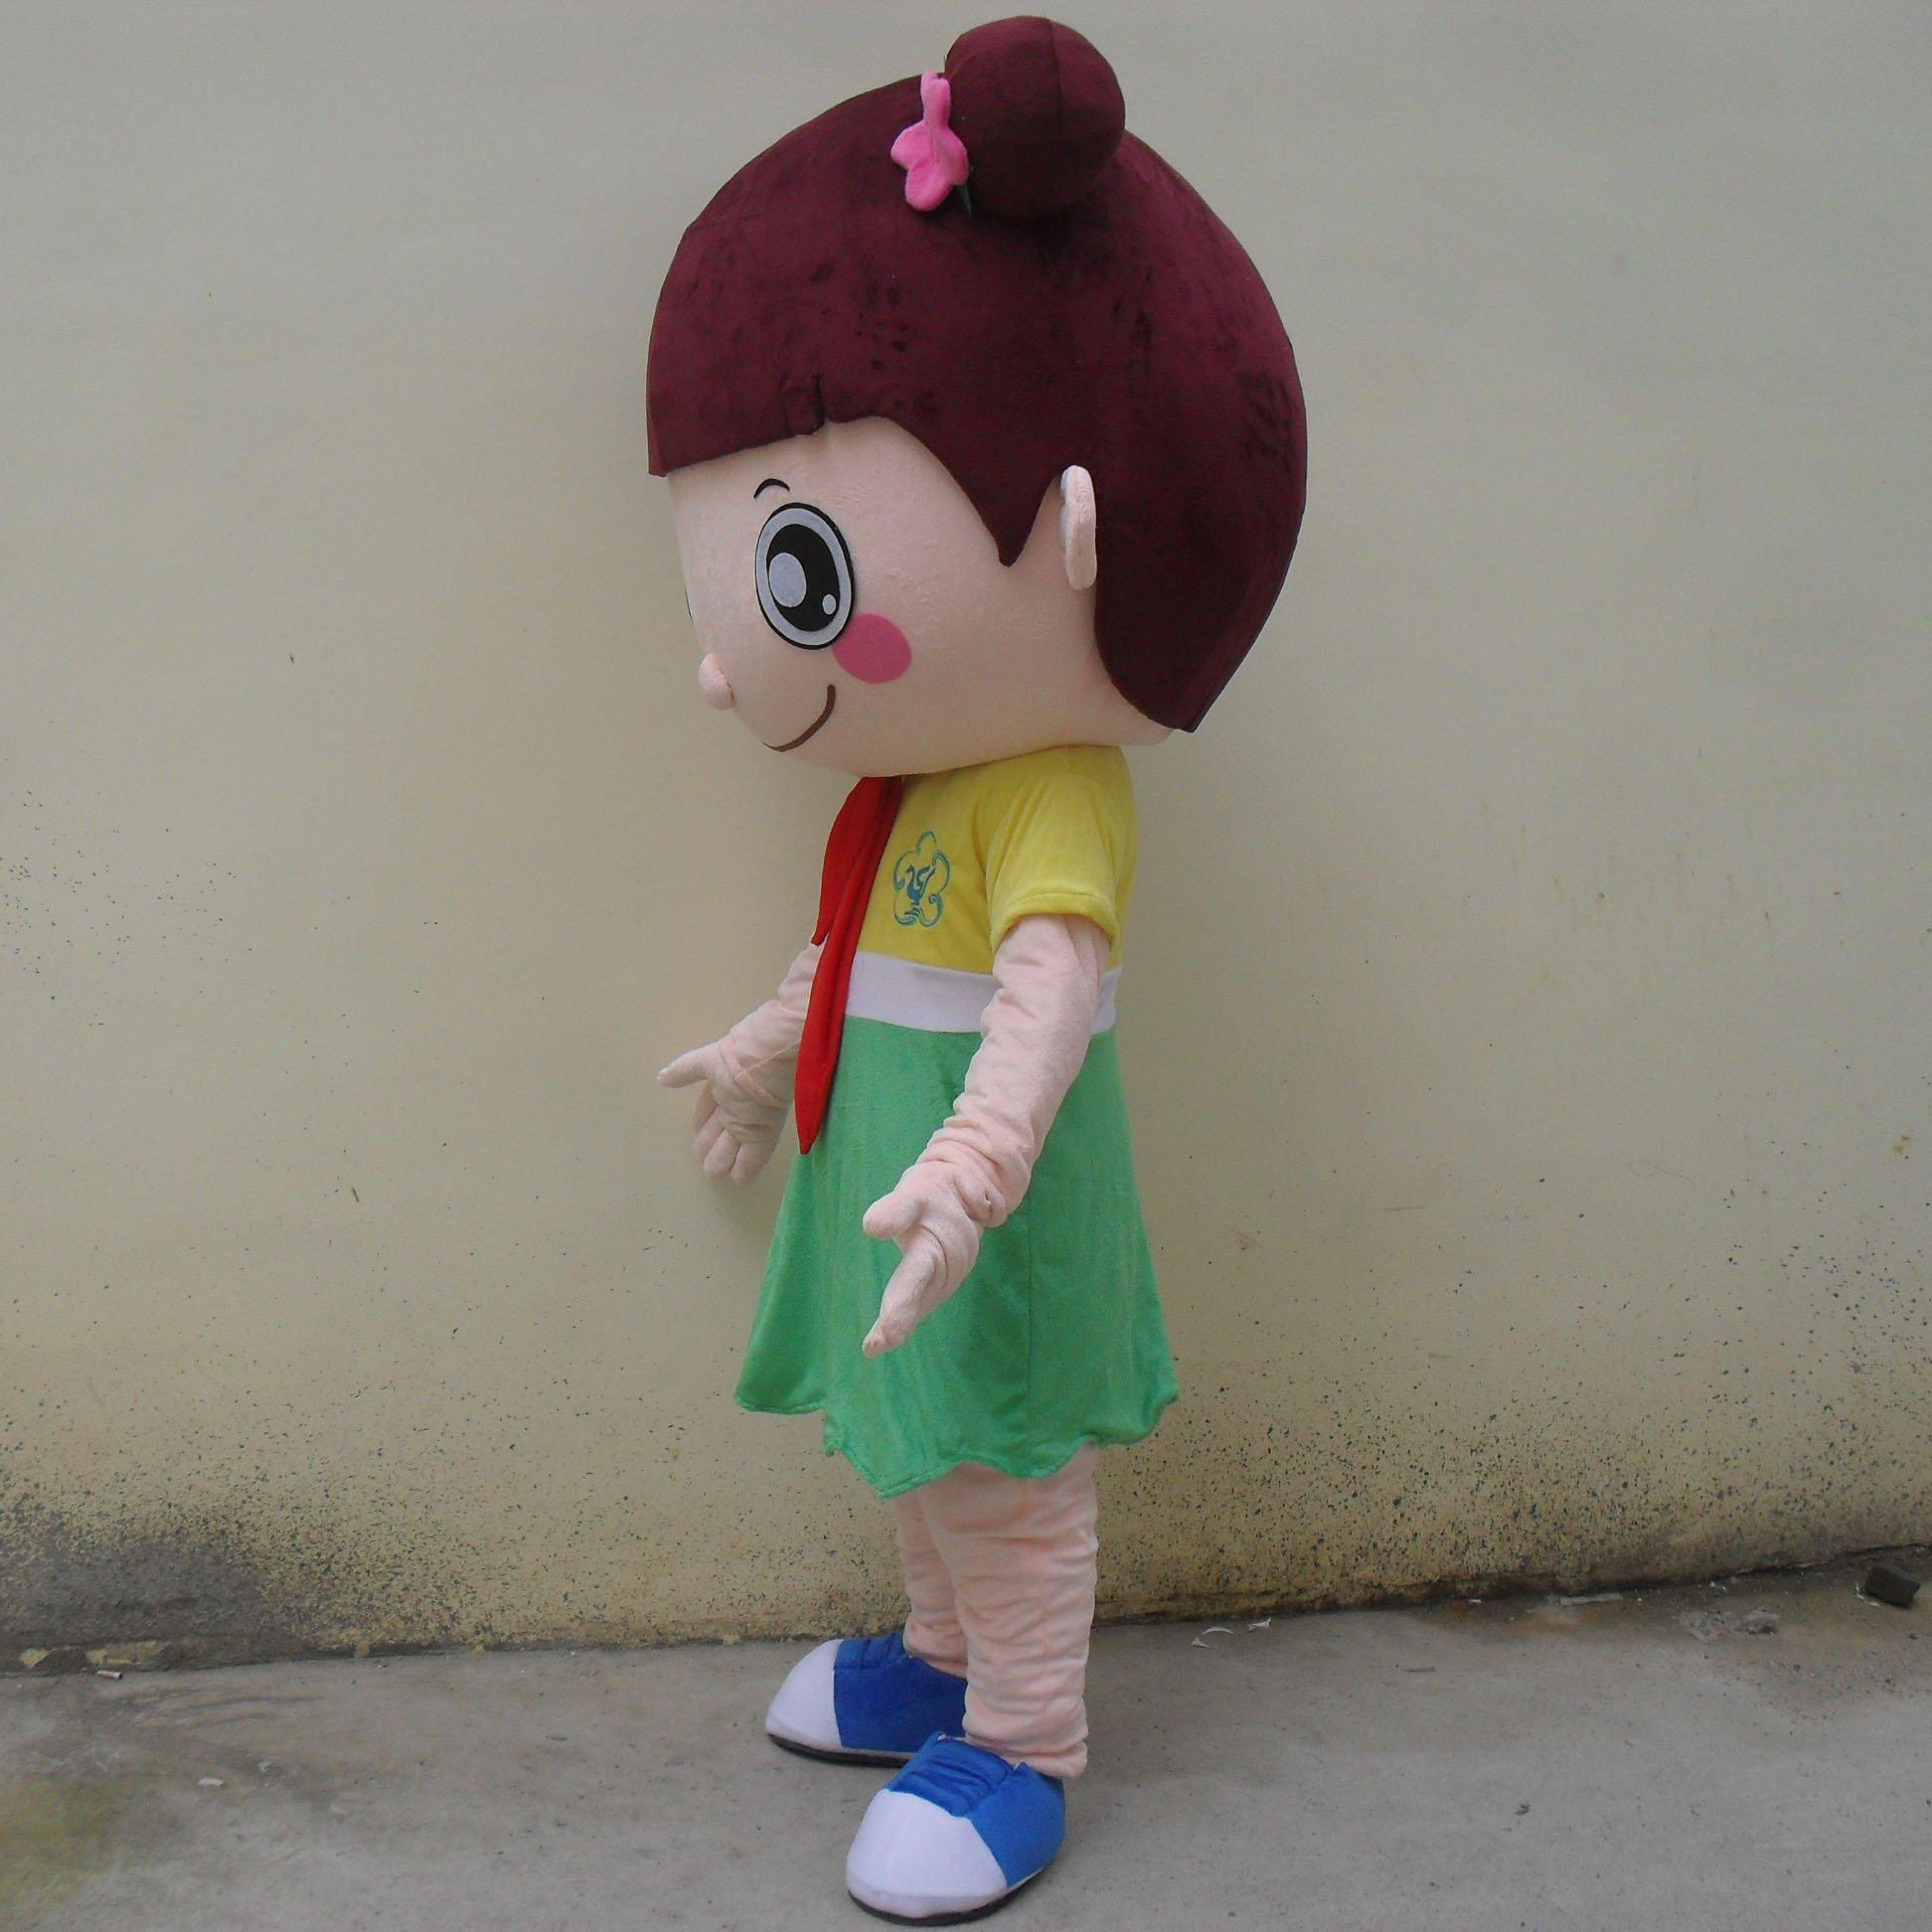 Cartoon Doll Clothing Cartoon Walking Doll Clothing Cartoon Show Clothing Plush Doll Dress Girl Mascot Costume